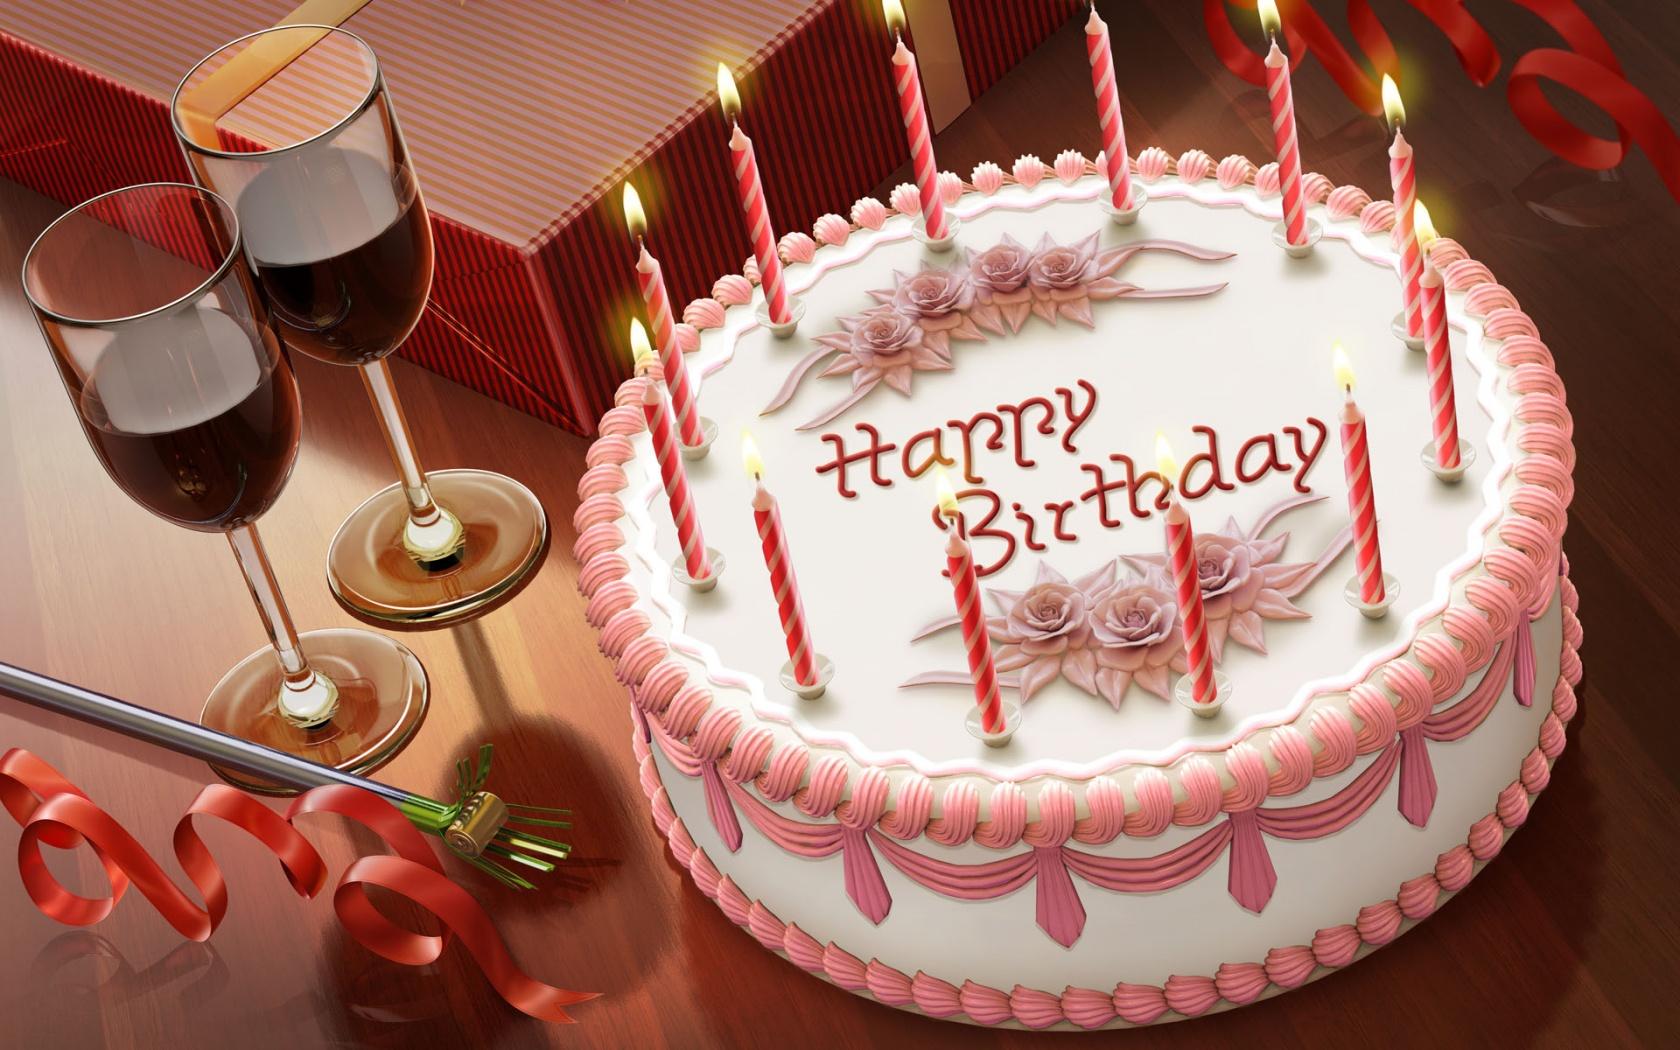 Happy Birthday Wallpaper Free Download